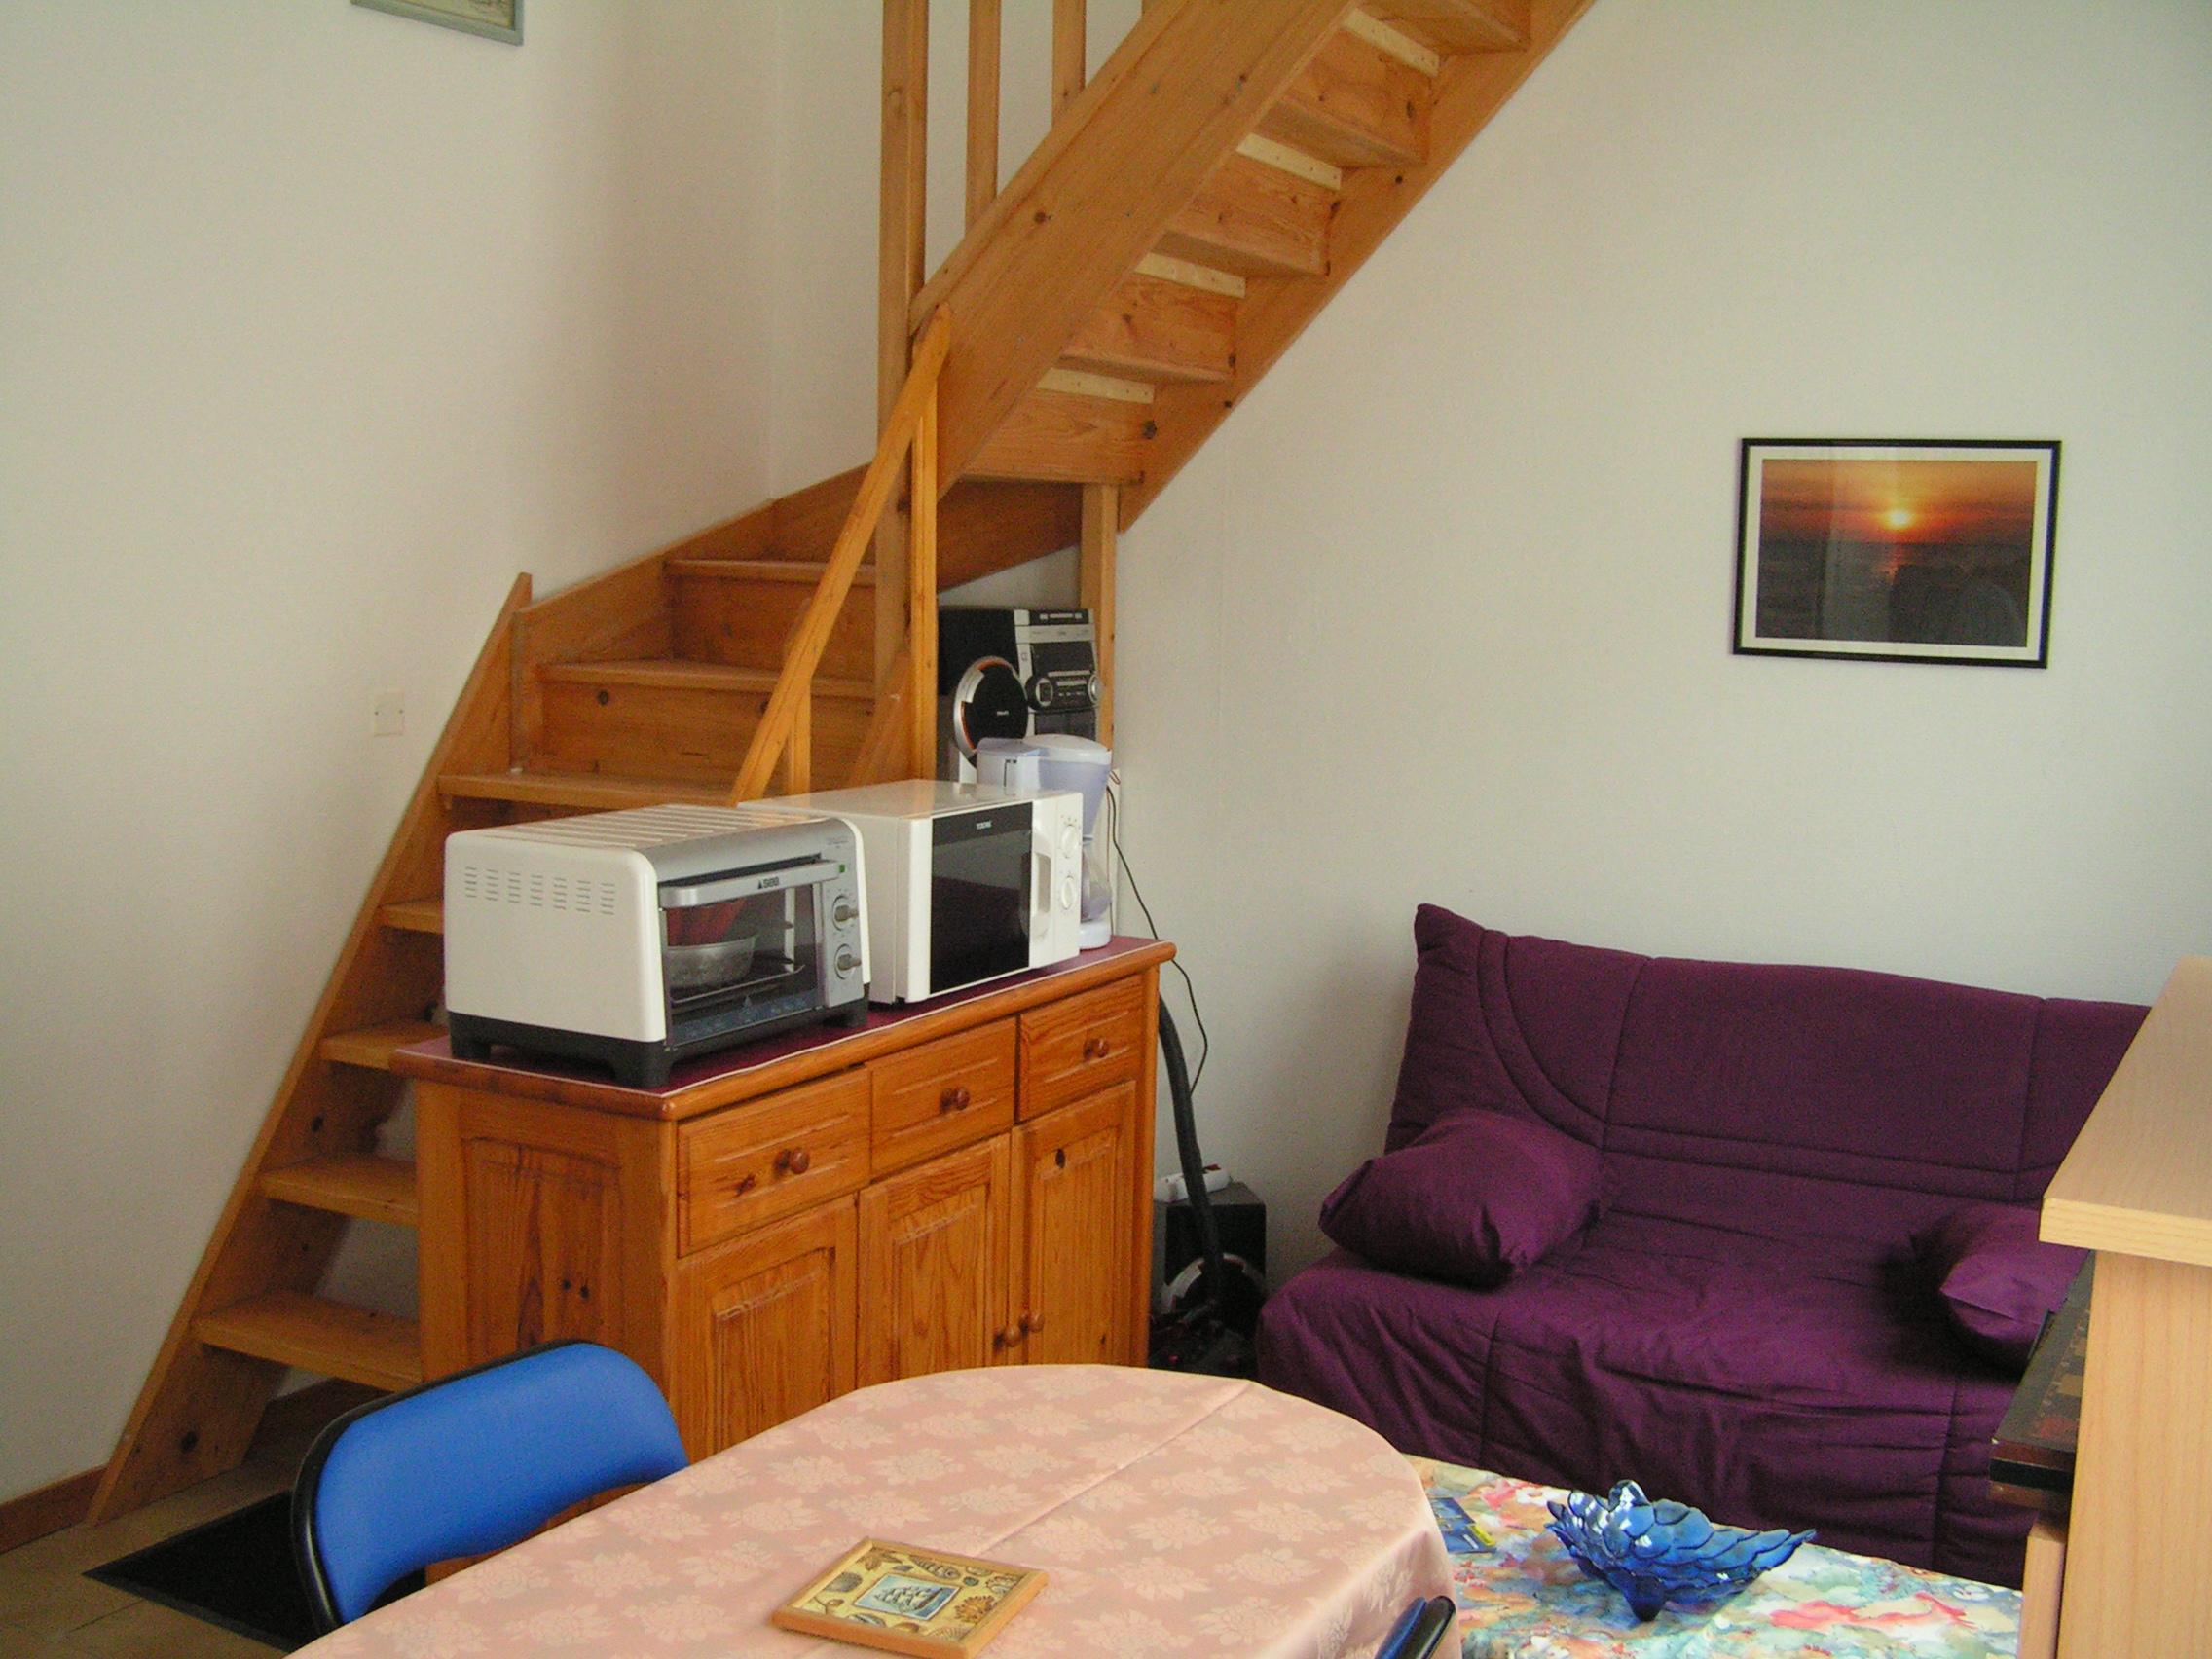 Saujon 17 thermes location studio meuble 30 m2 location de meubl s de tourisme saujon - Location studio meuble perpignan ...